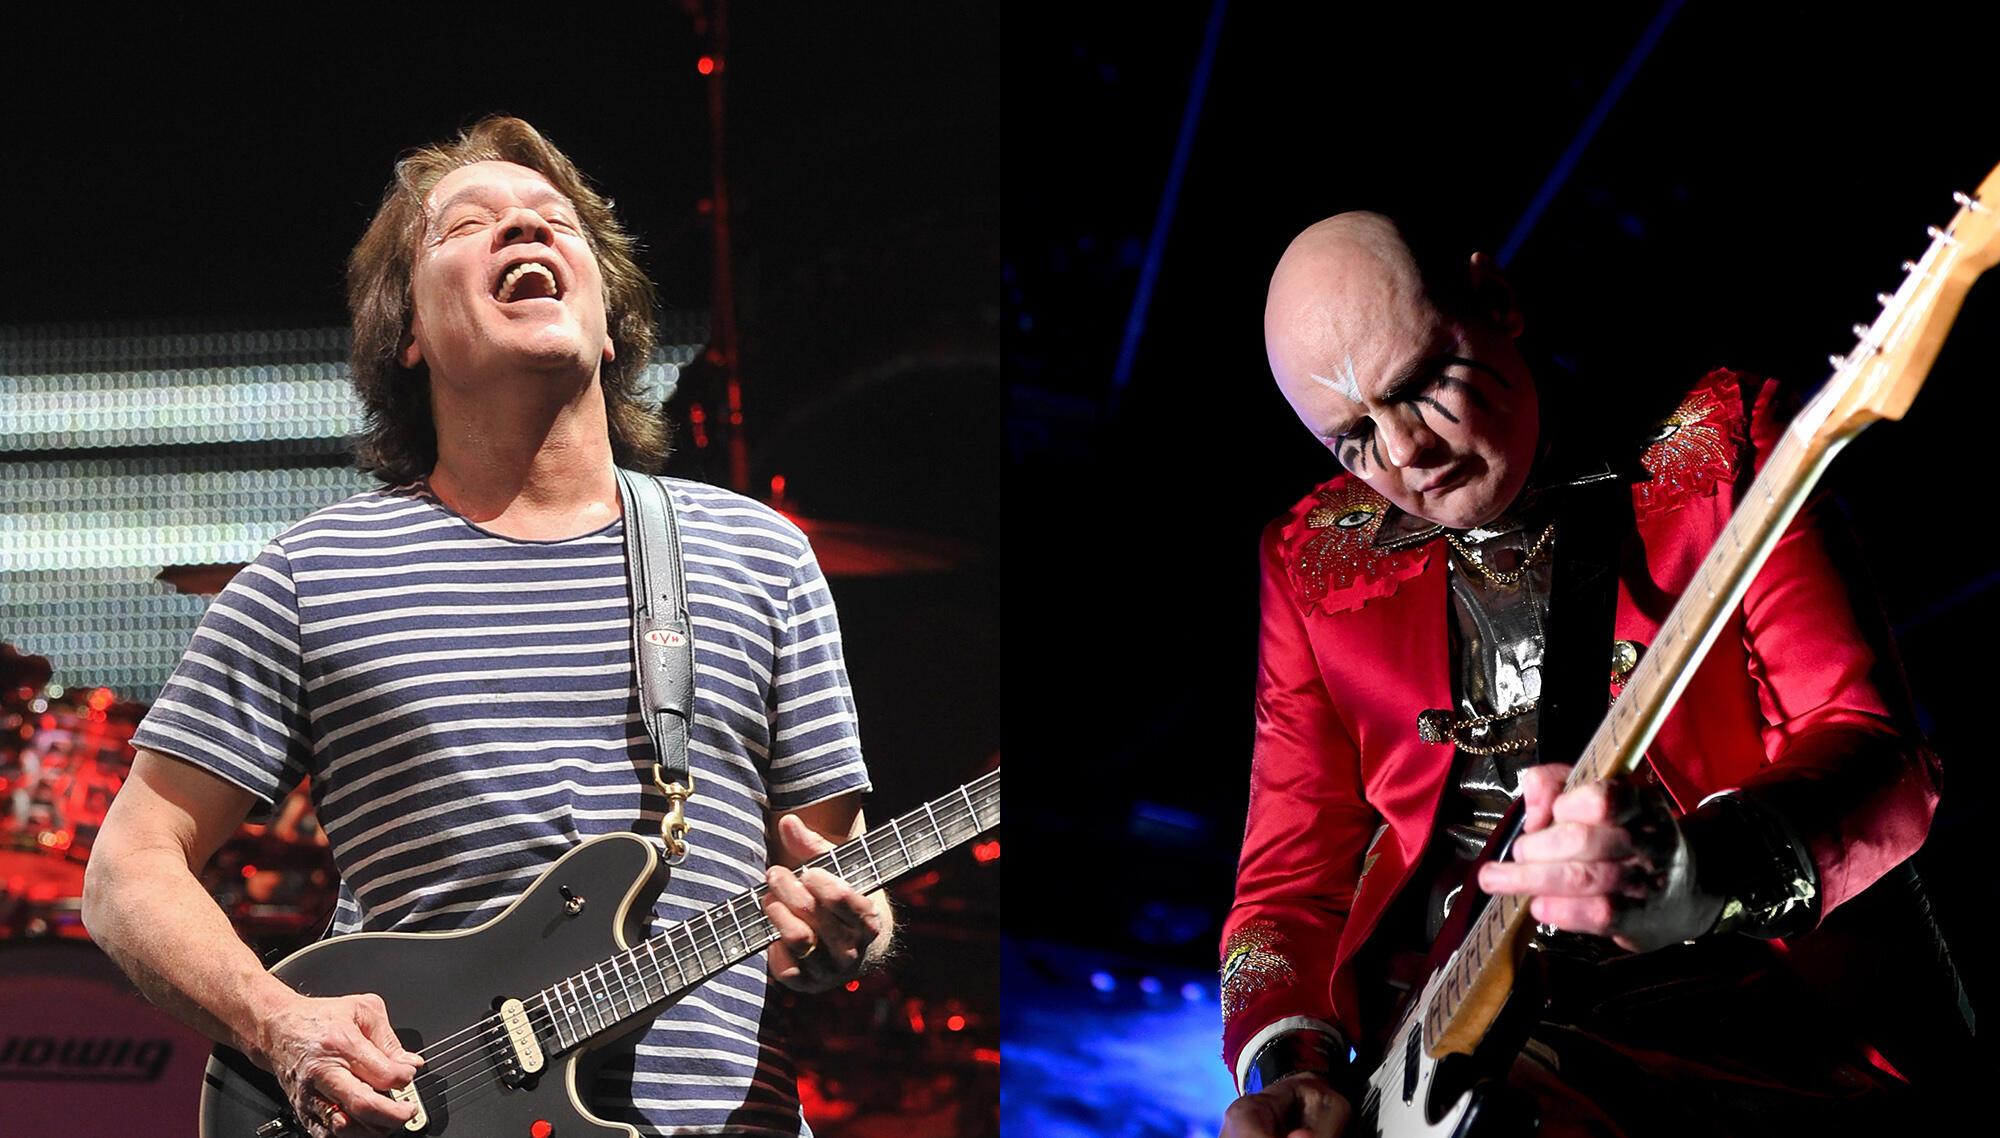 Billy Corgan Recalls Van Halen's Impromptu Test: 'I Wanna See You Play'